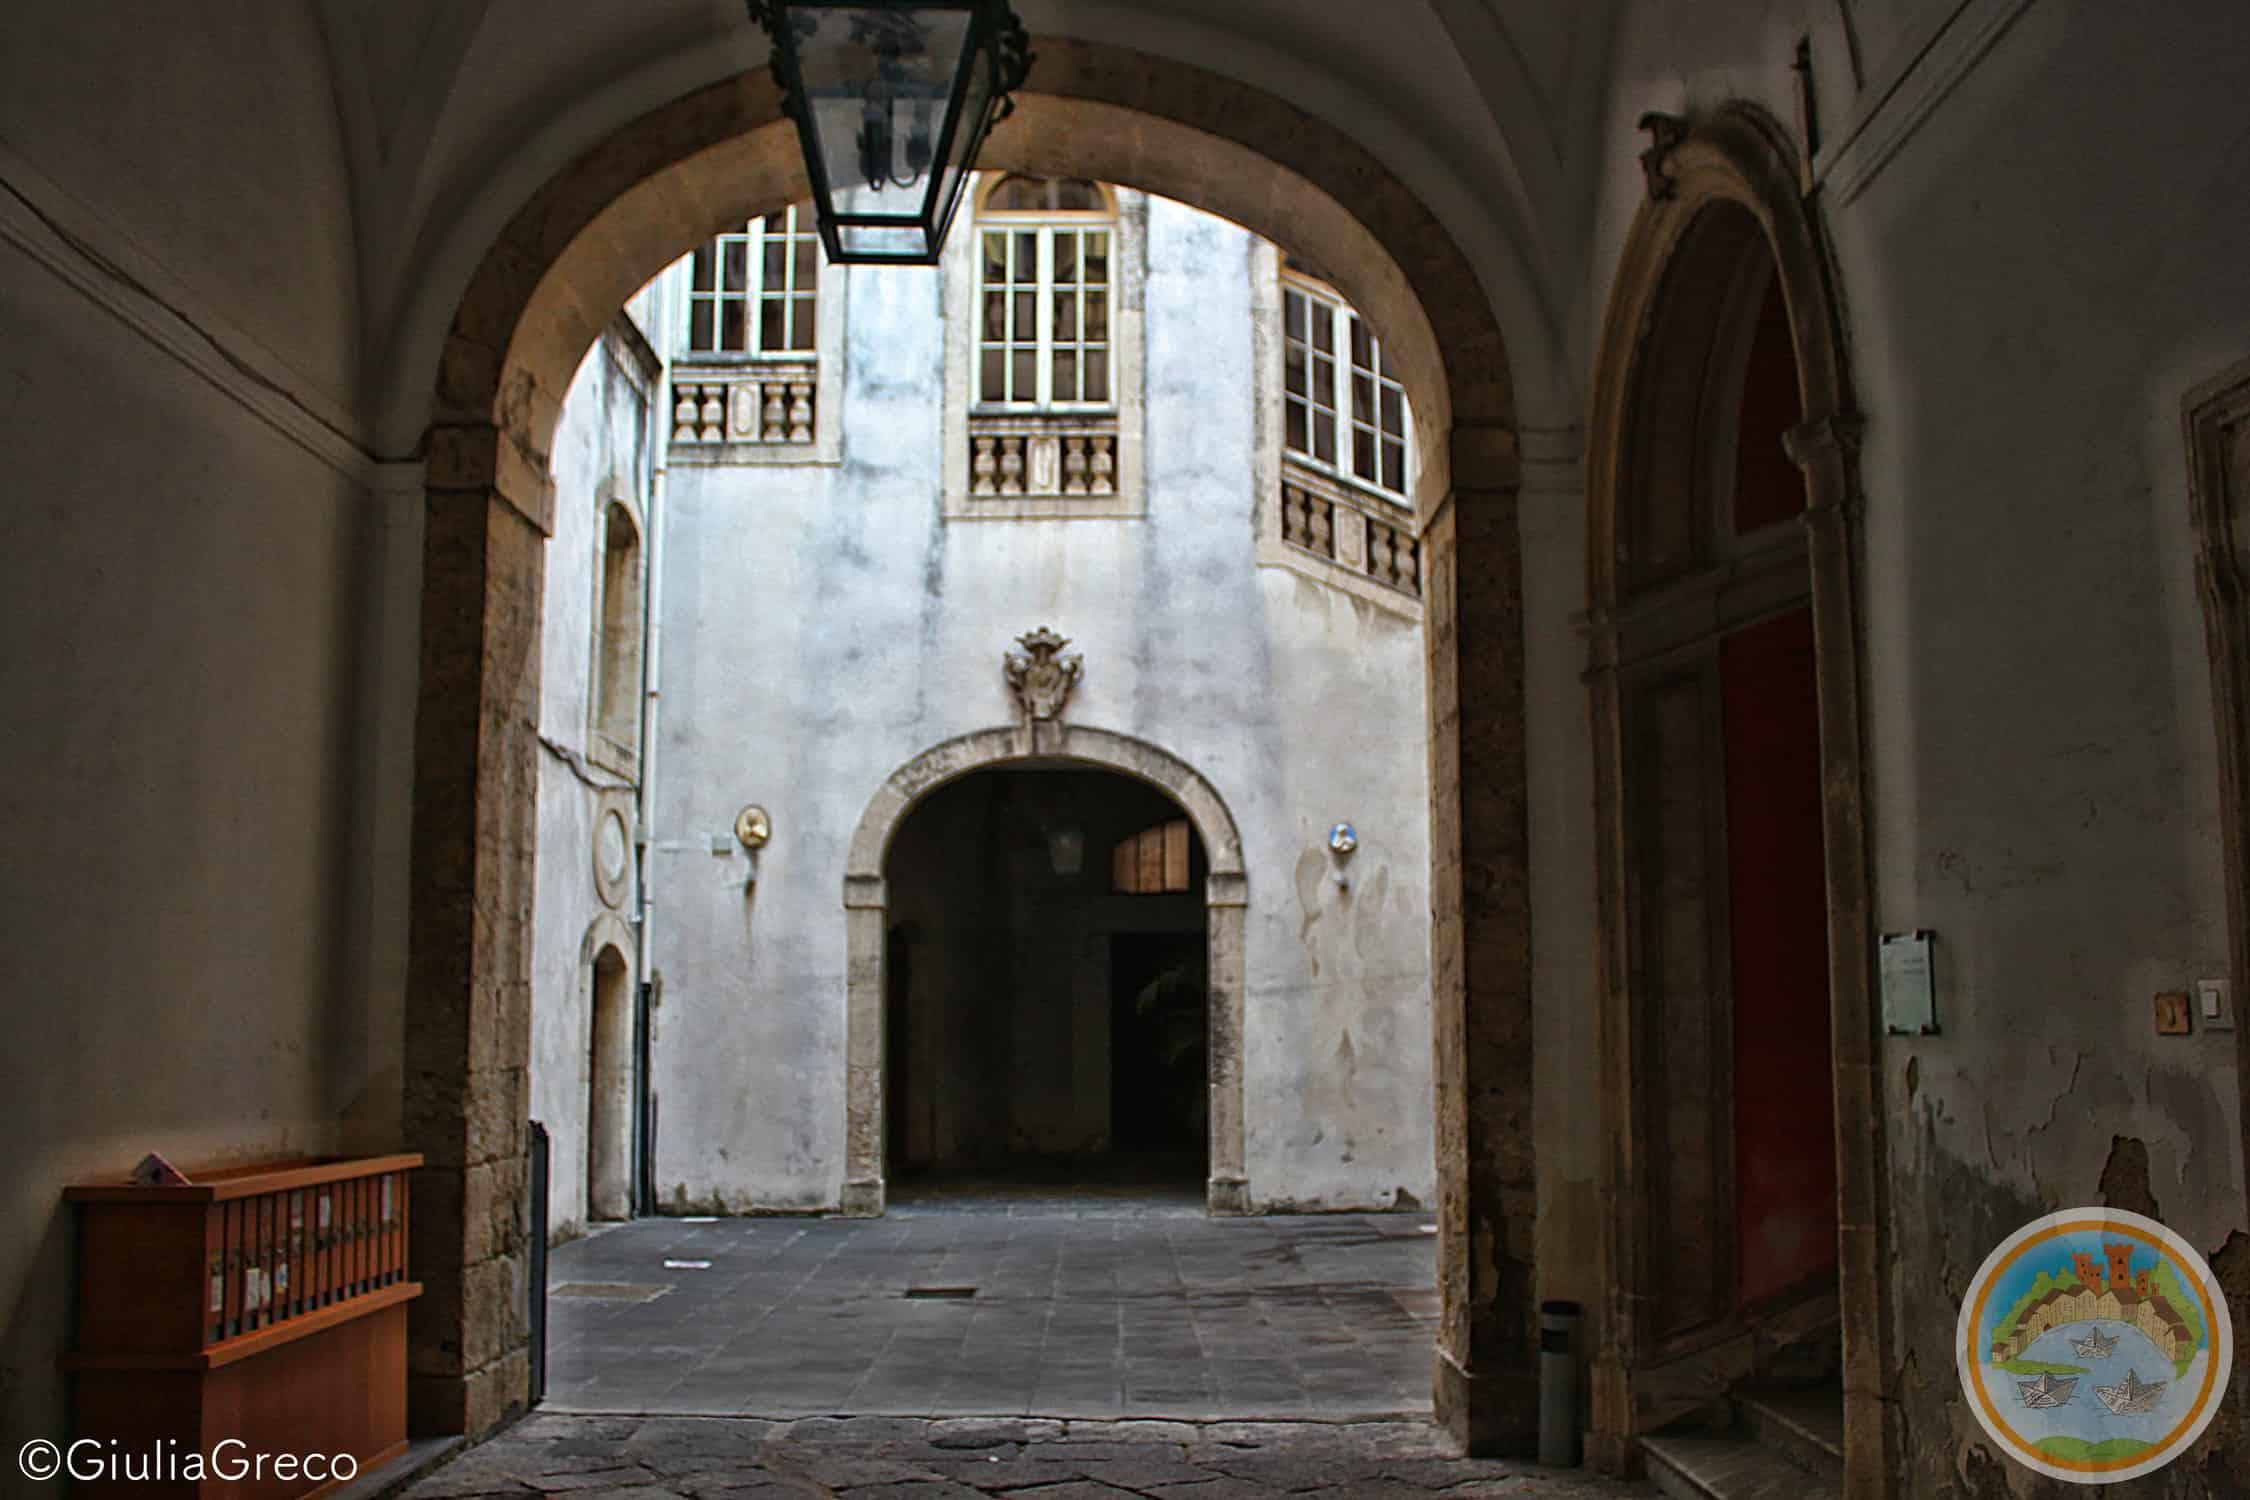 Palazzo Calapaj d'Alcontres: come viveva un nobile del 700?